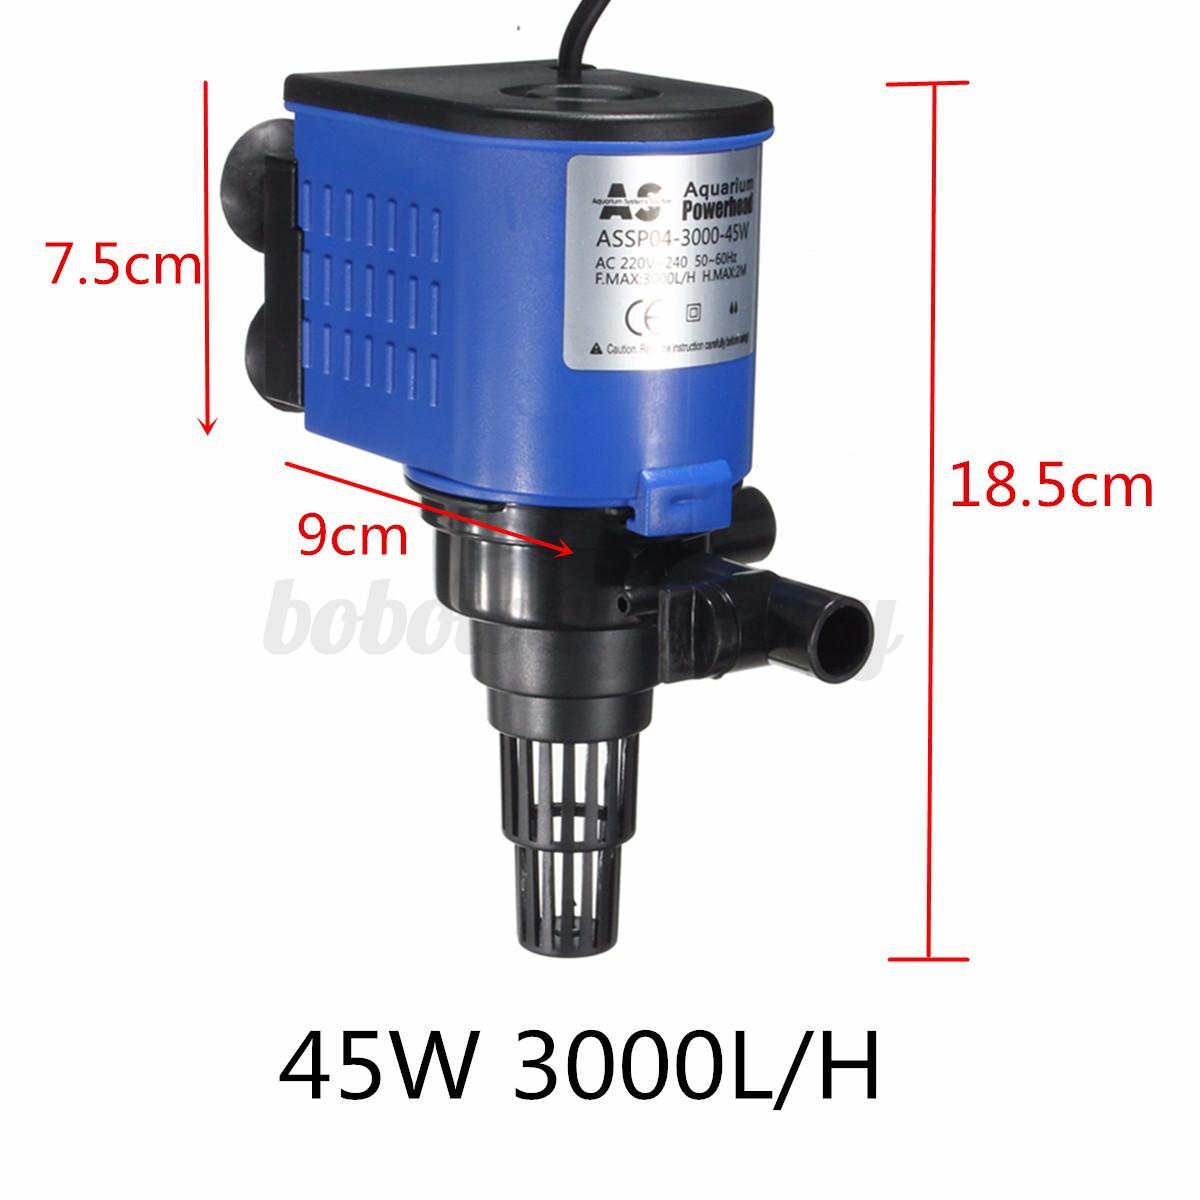 3 in 1 aquarium fish tank powerhead wave maker for Fish tank oxygen pump